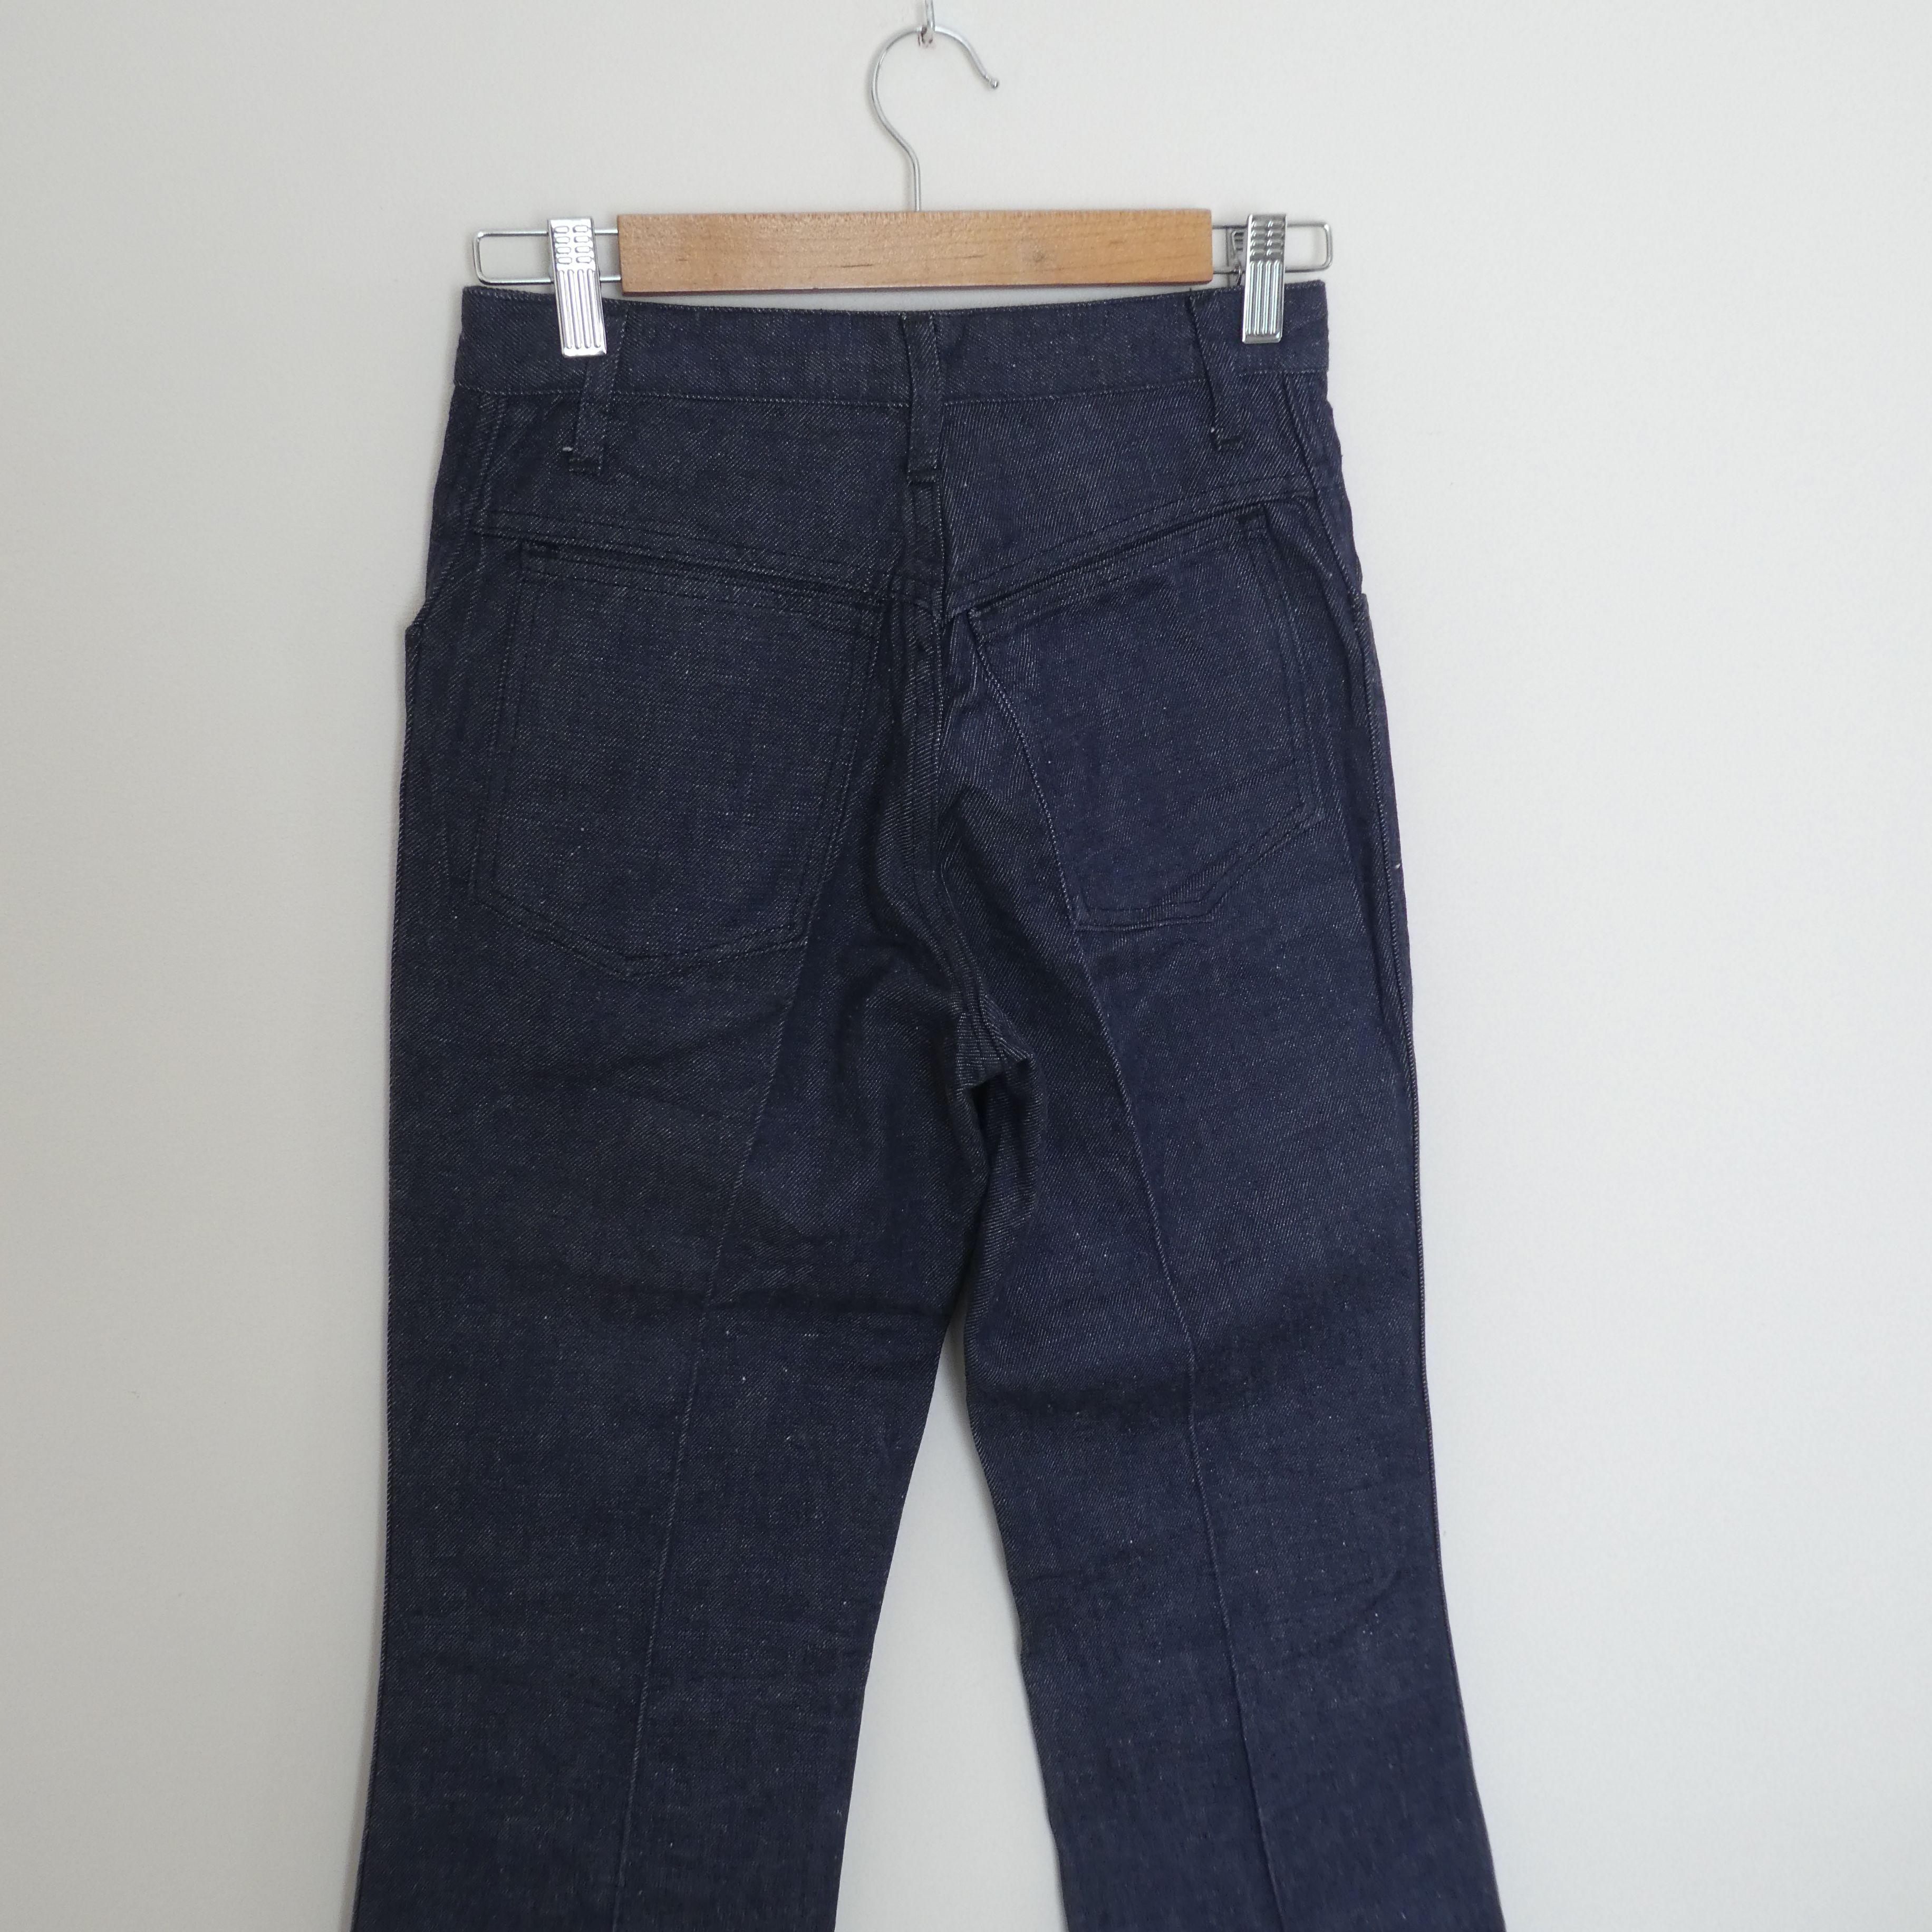 Pantalons - Jean flare bleu foncé